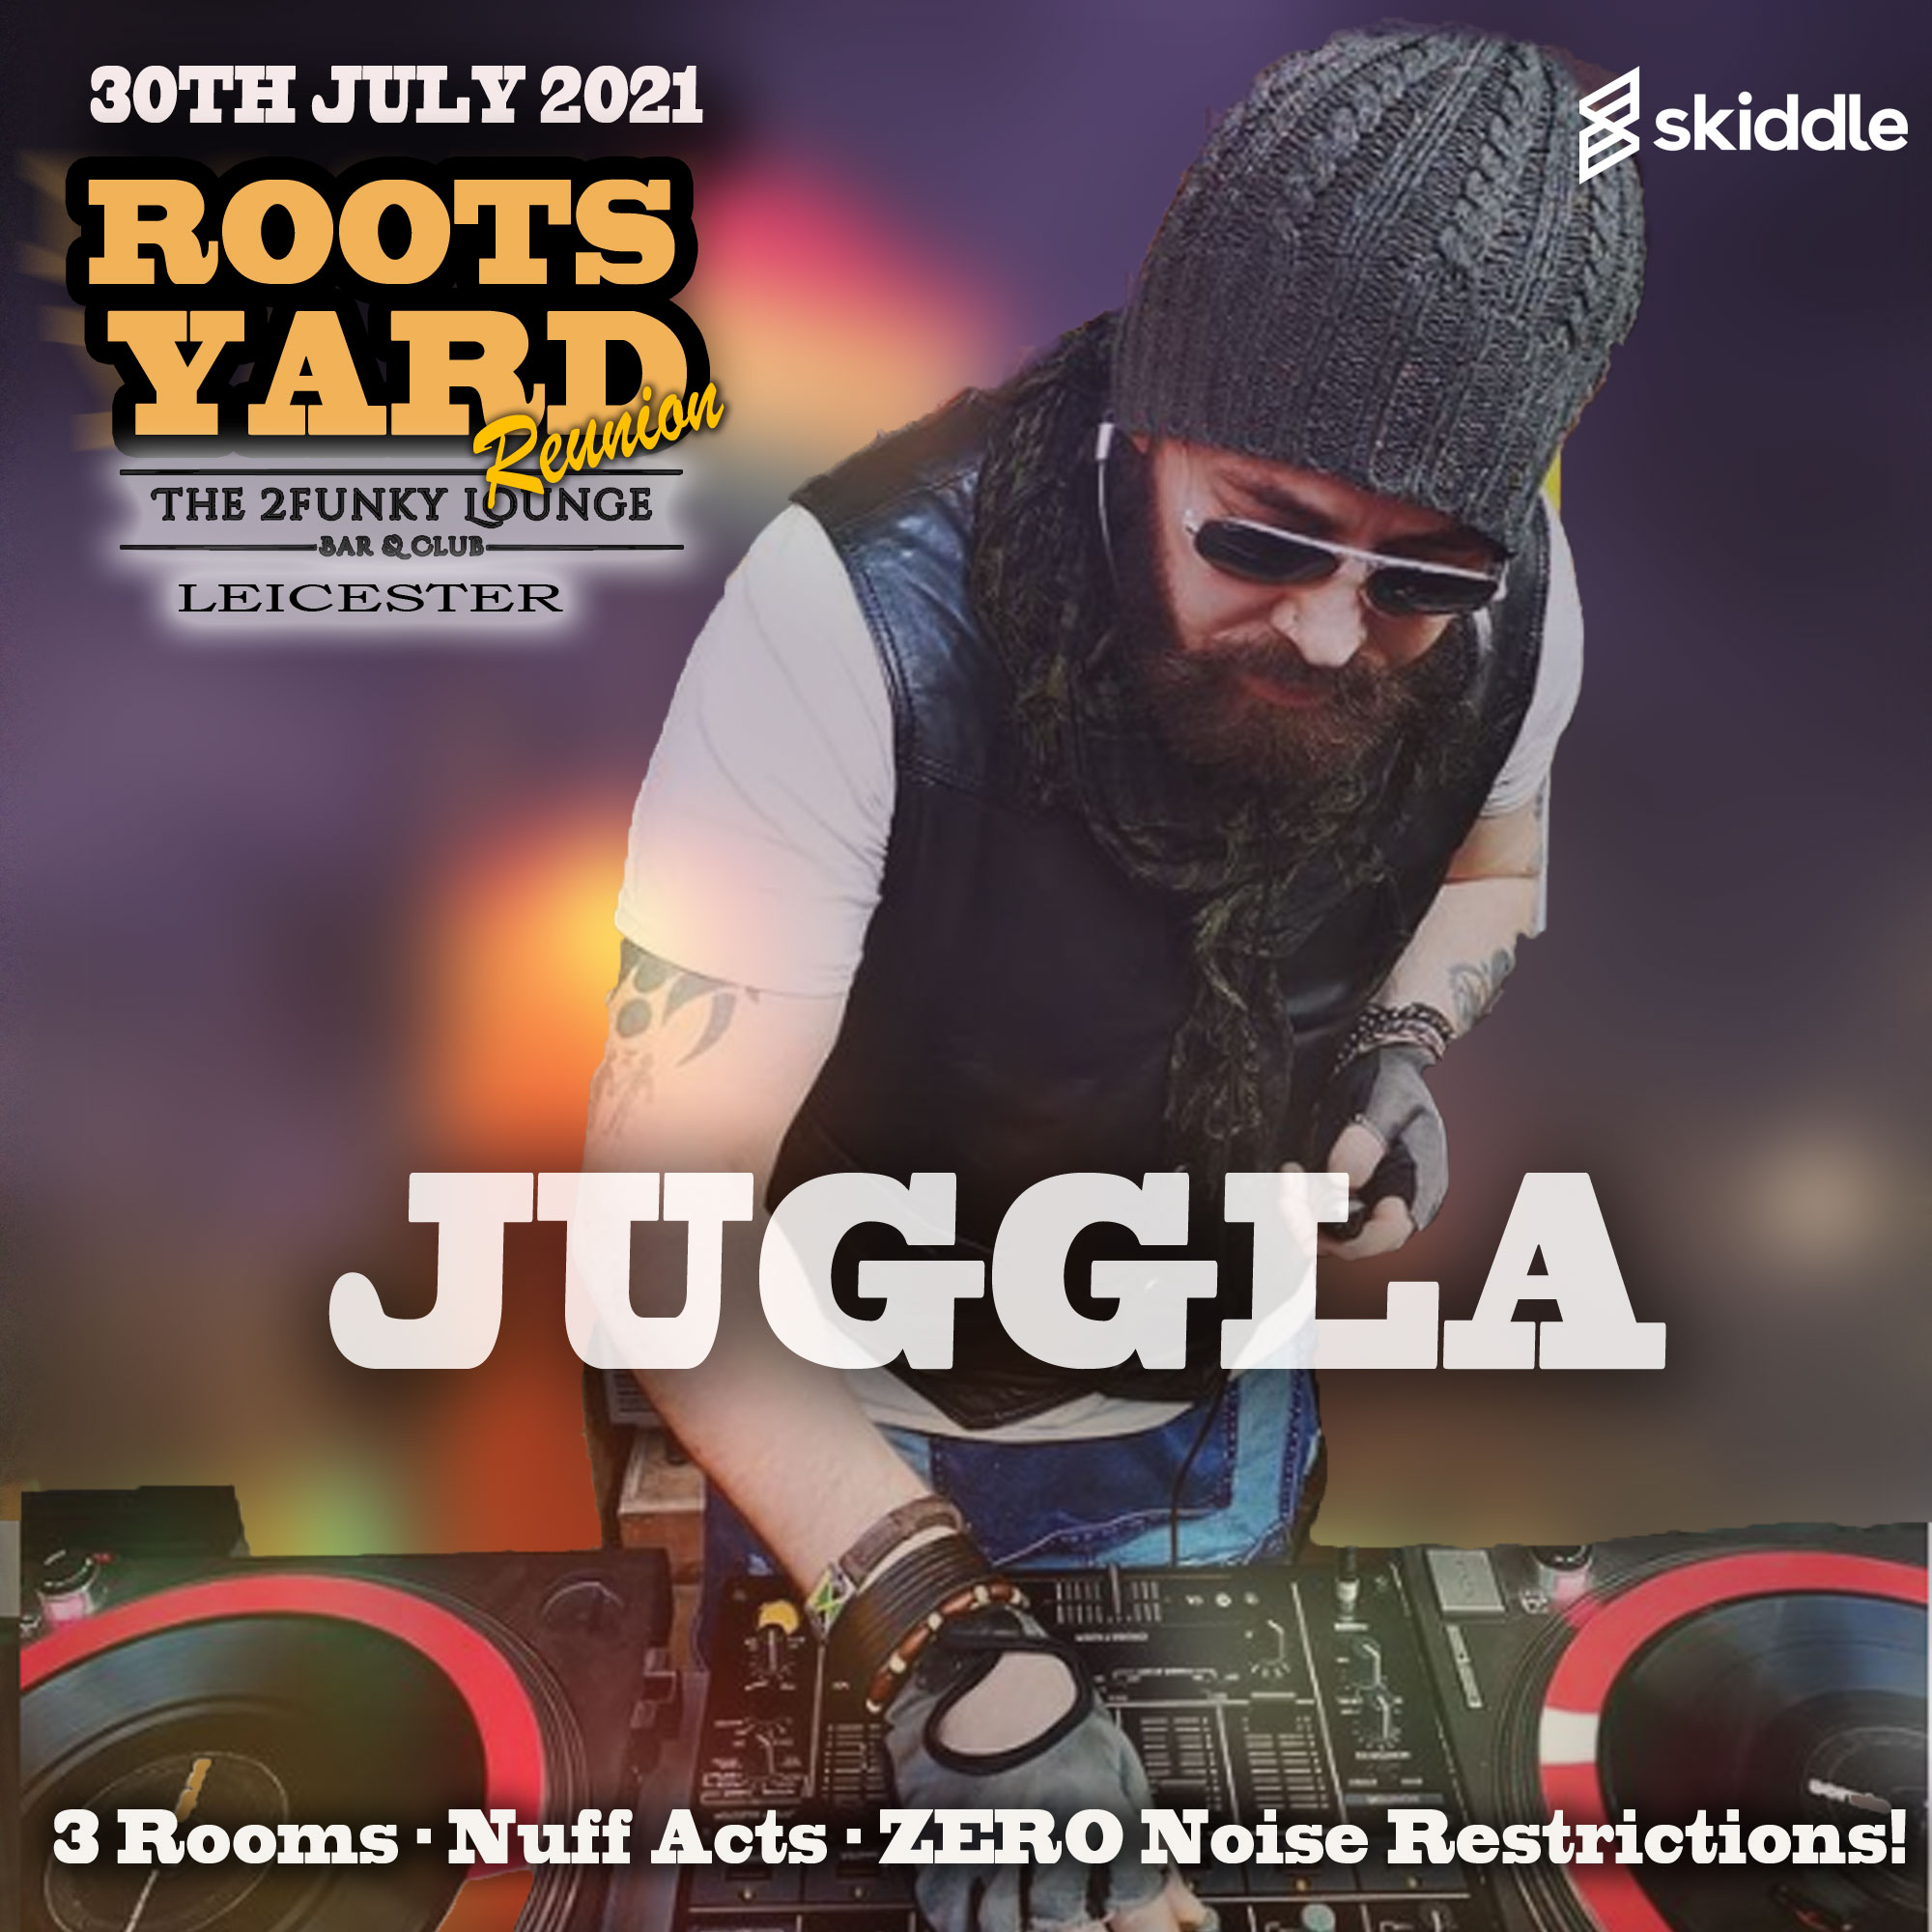 juggla---roots-yard-reunion-insta-post